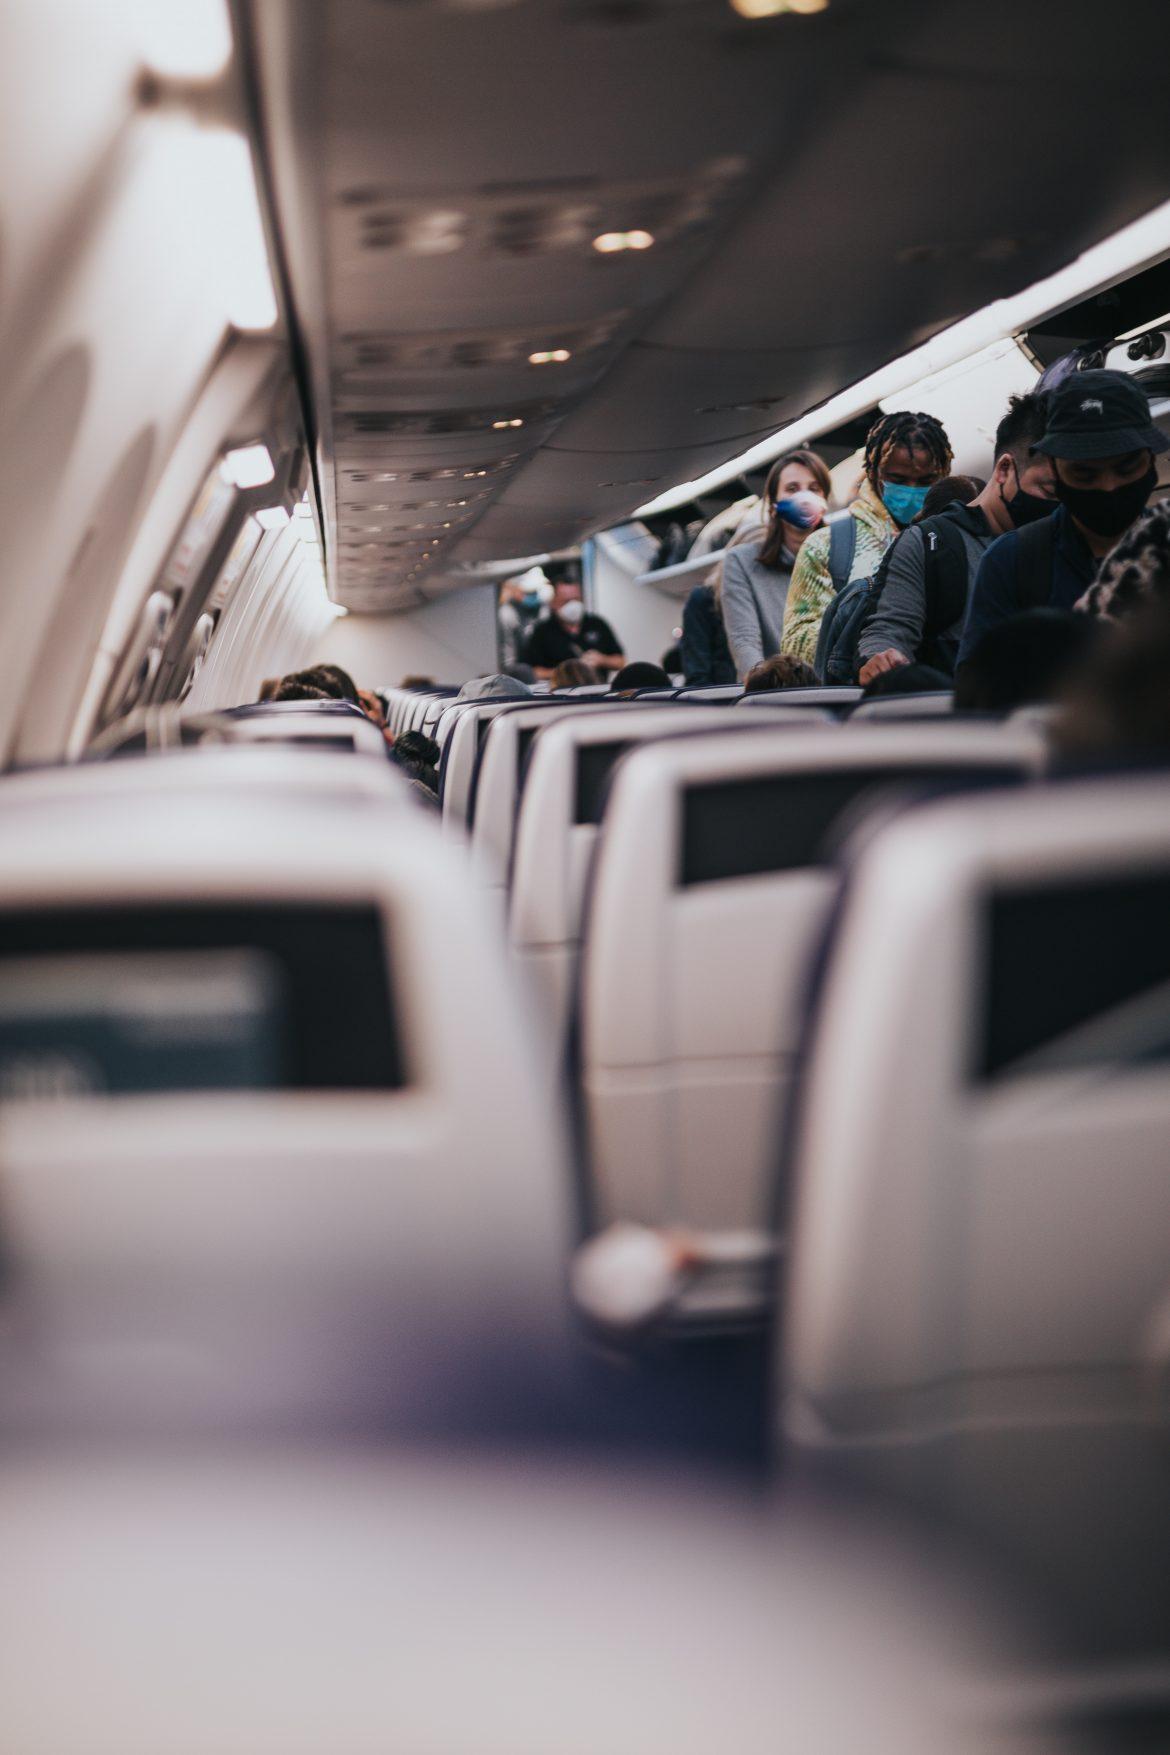 New COVID-19 Travel Regulations: Roadblock for International Students